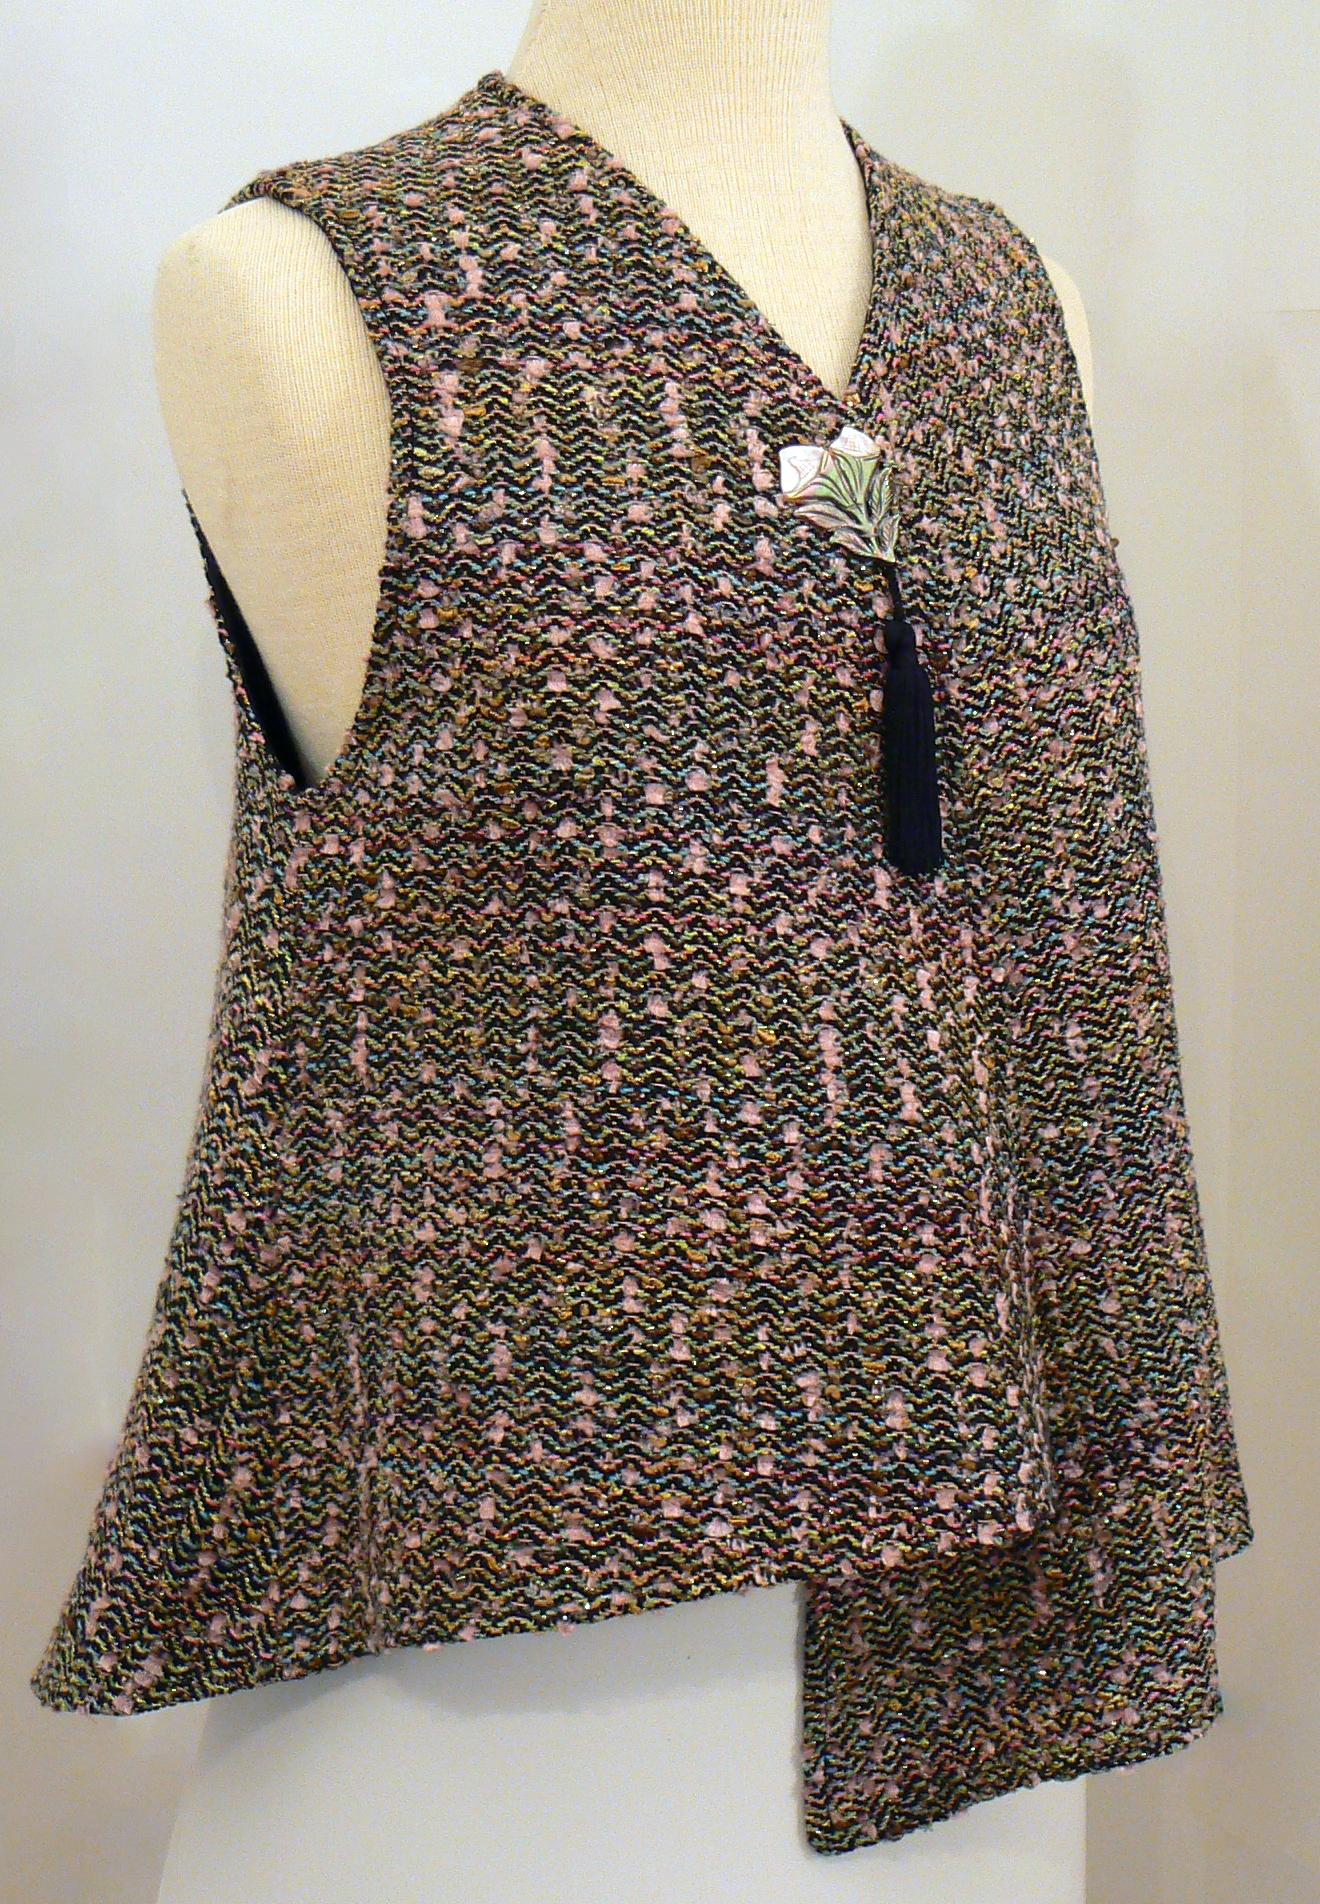 Handwoven Clothing, Vest, Kathleen Weir-West, 28-001.JPG